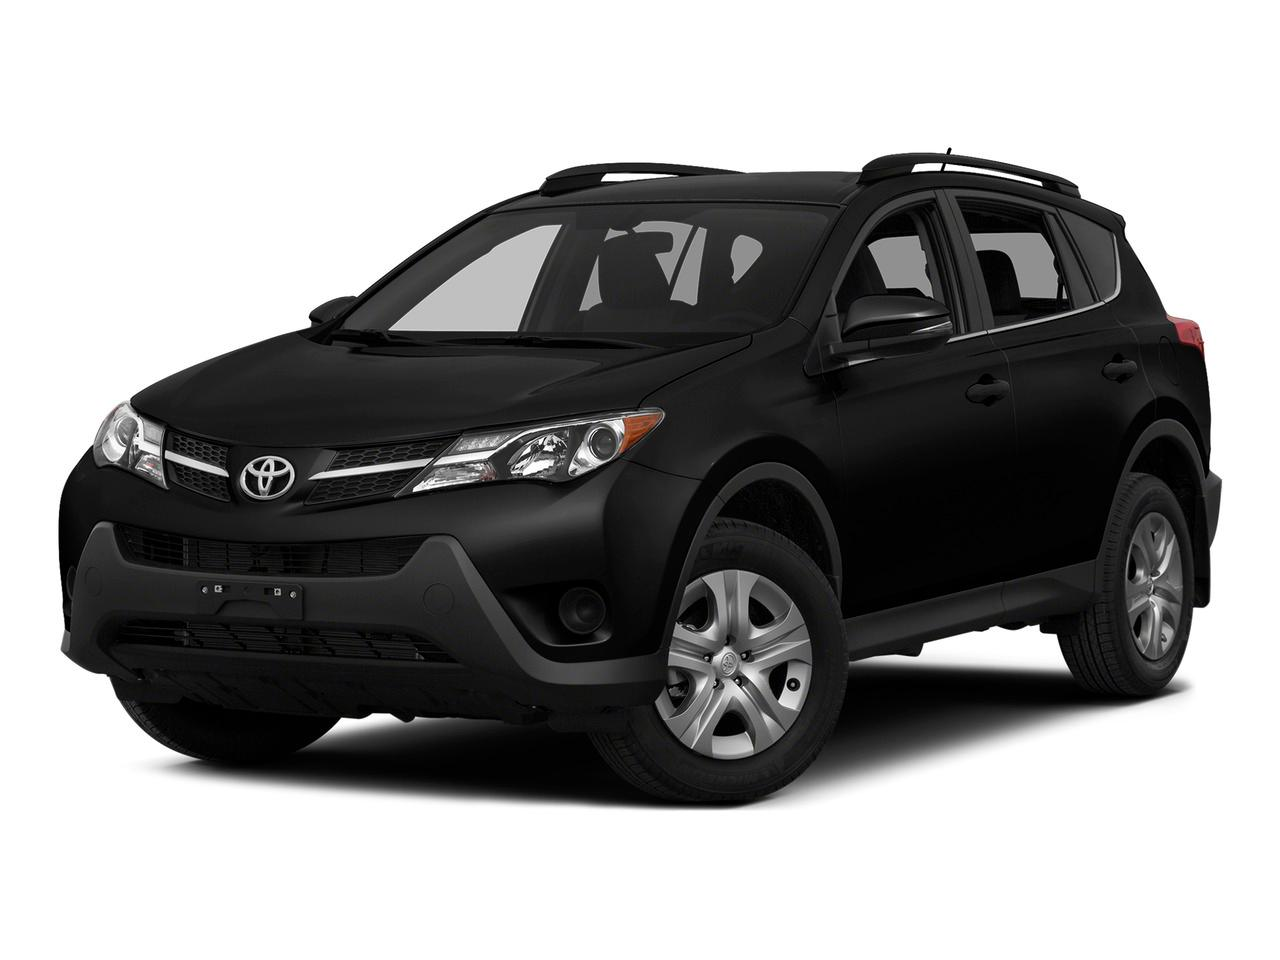 2015 Toyota RAV4 Vehicle Photo in San Antonio, TX 78238